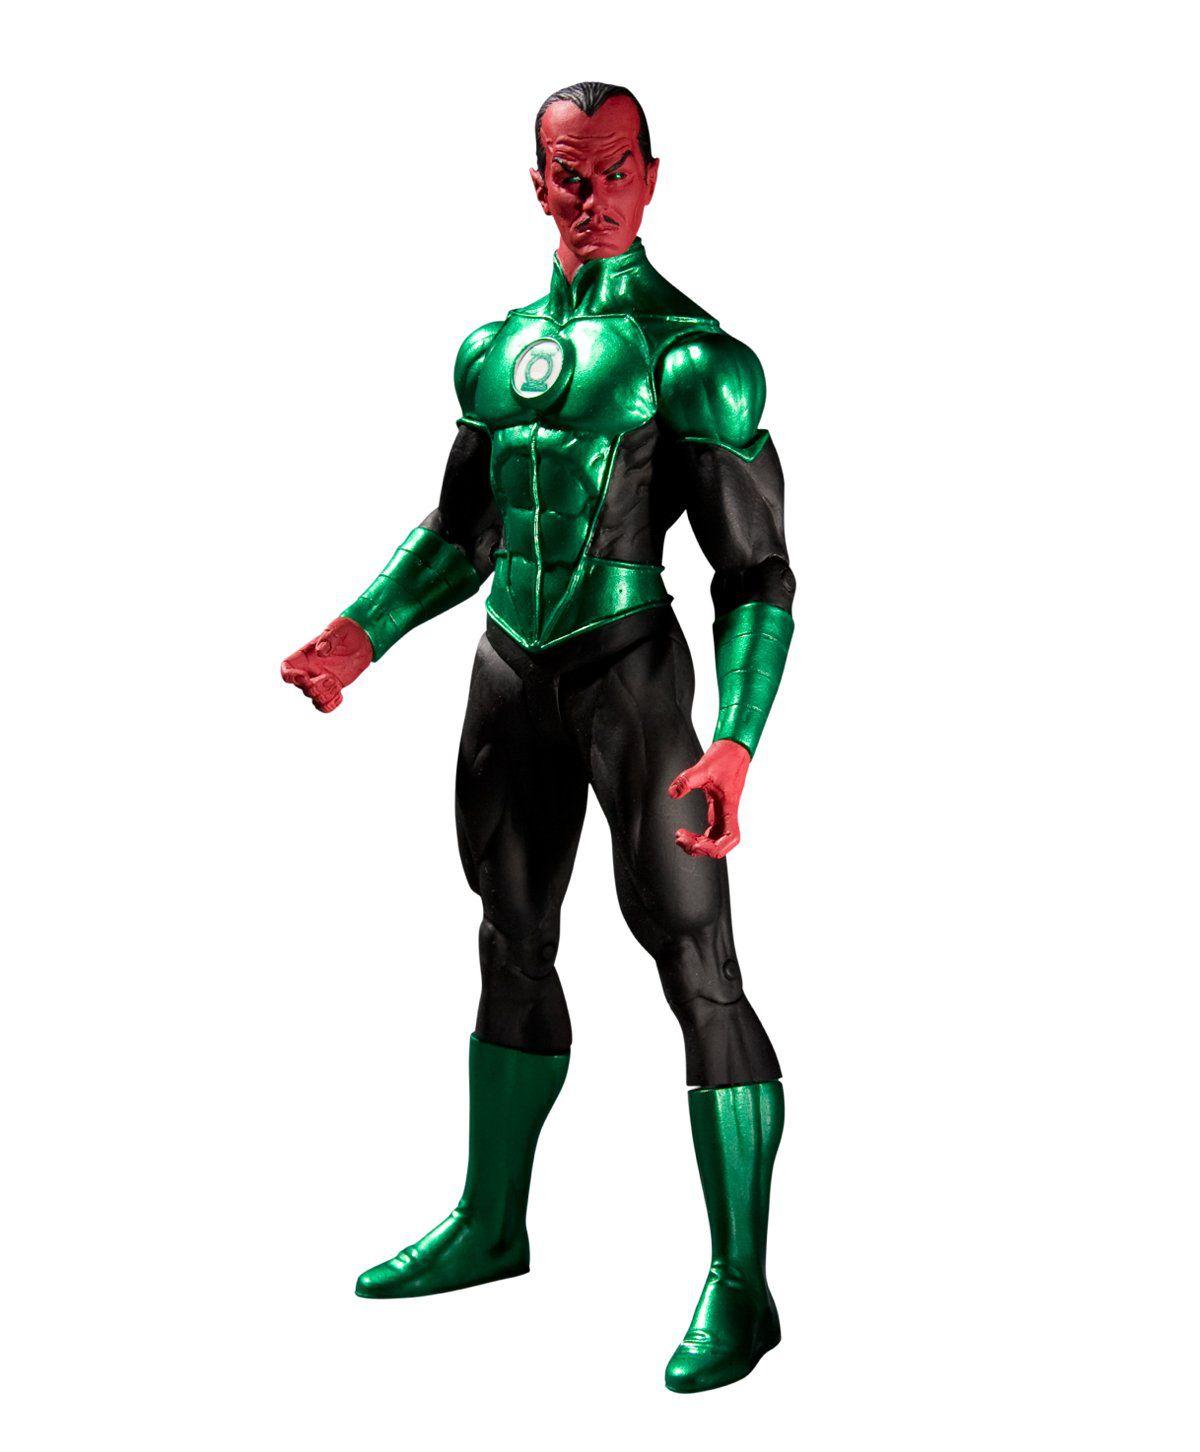 Boneco Sinestro: Lanterna Verde (Green Lantern) Series 5 - DC Direct - CG